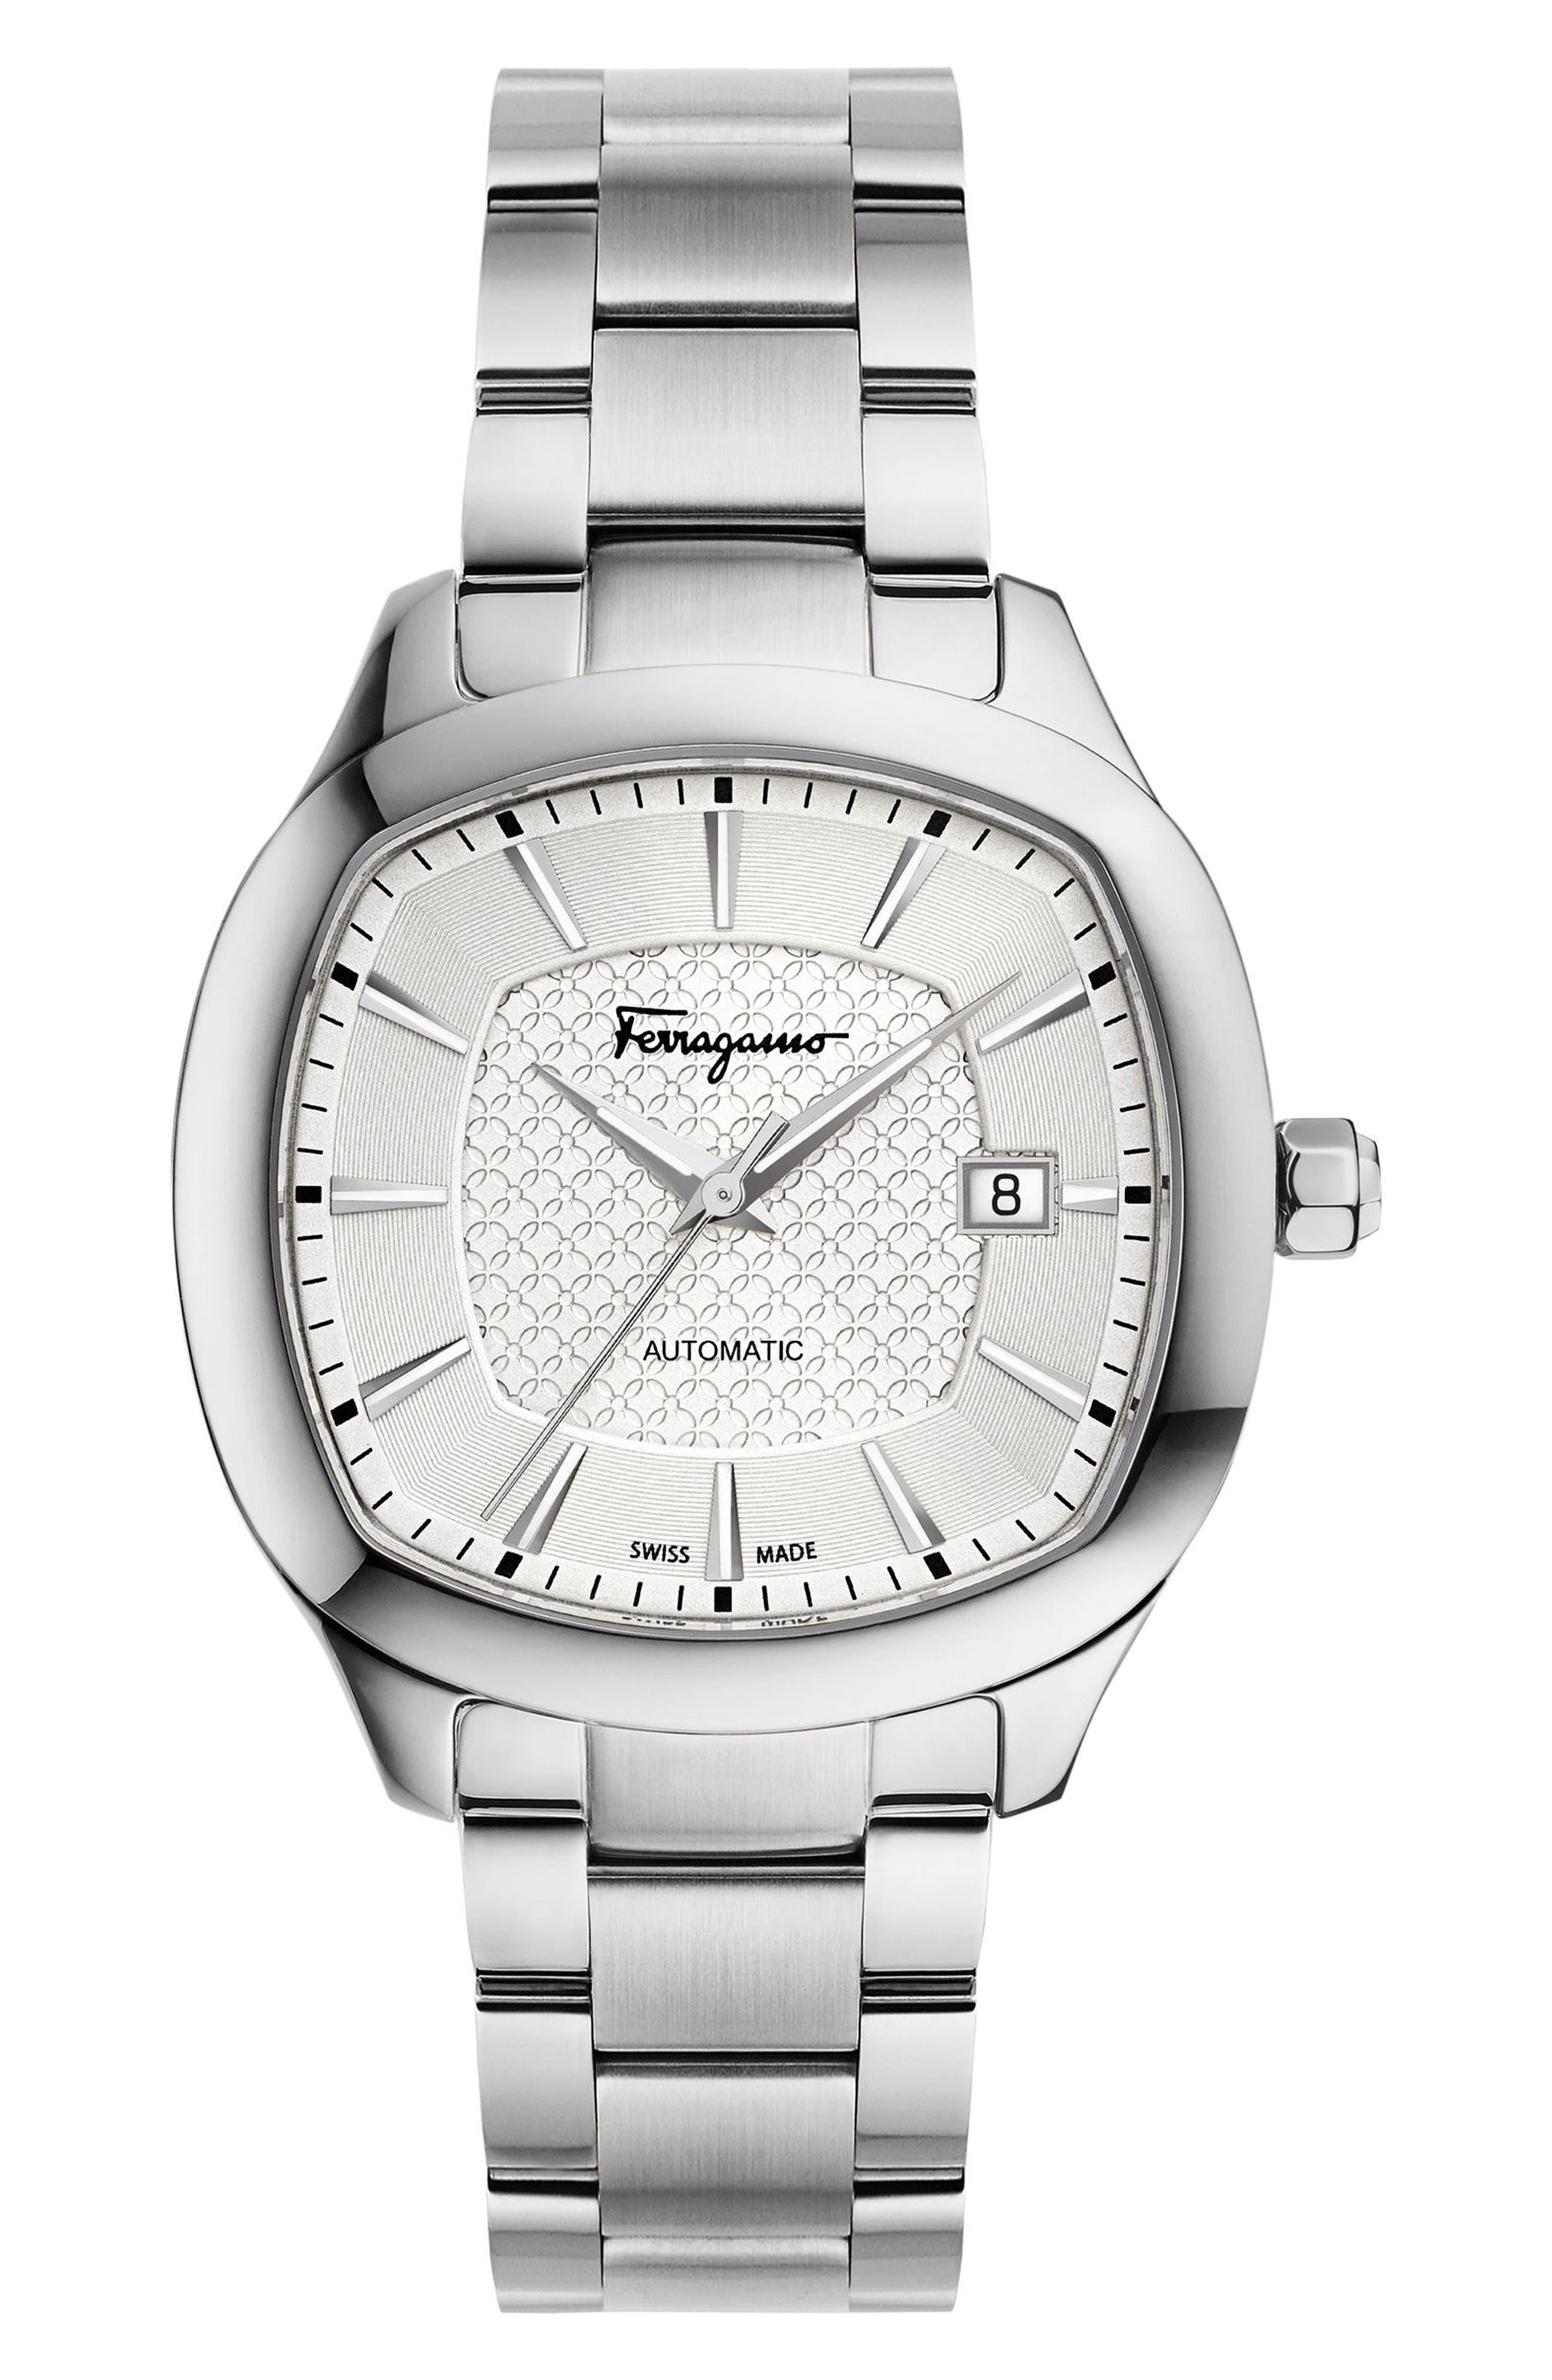 Main Image - Salvatore Ferragamo Square Automatic Bracelet Watch, 41mm